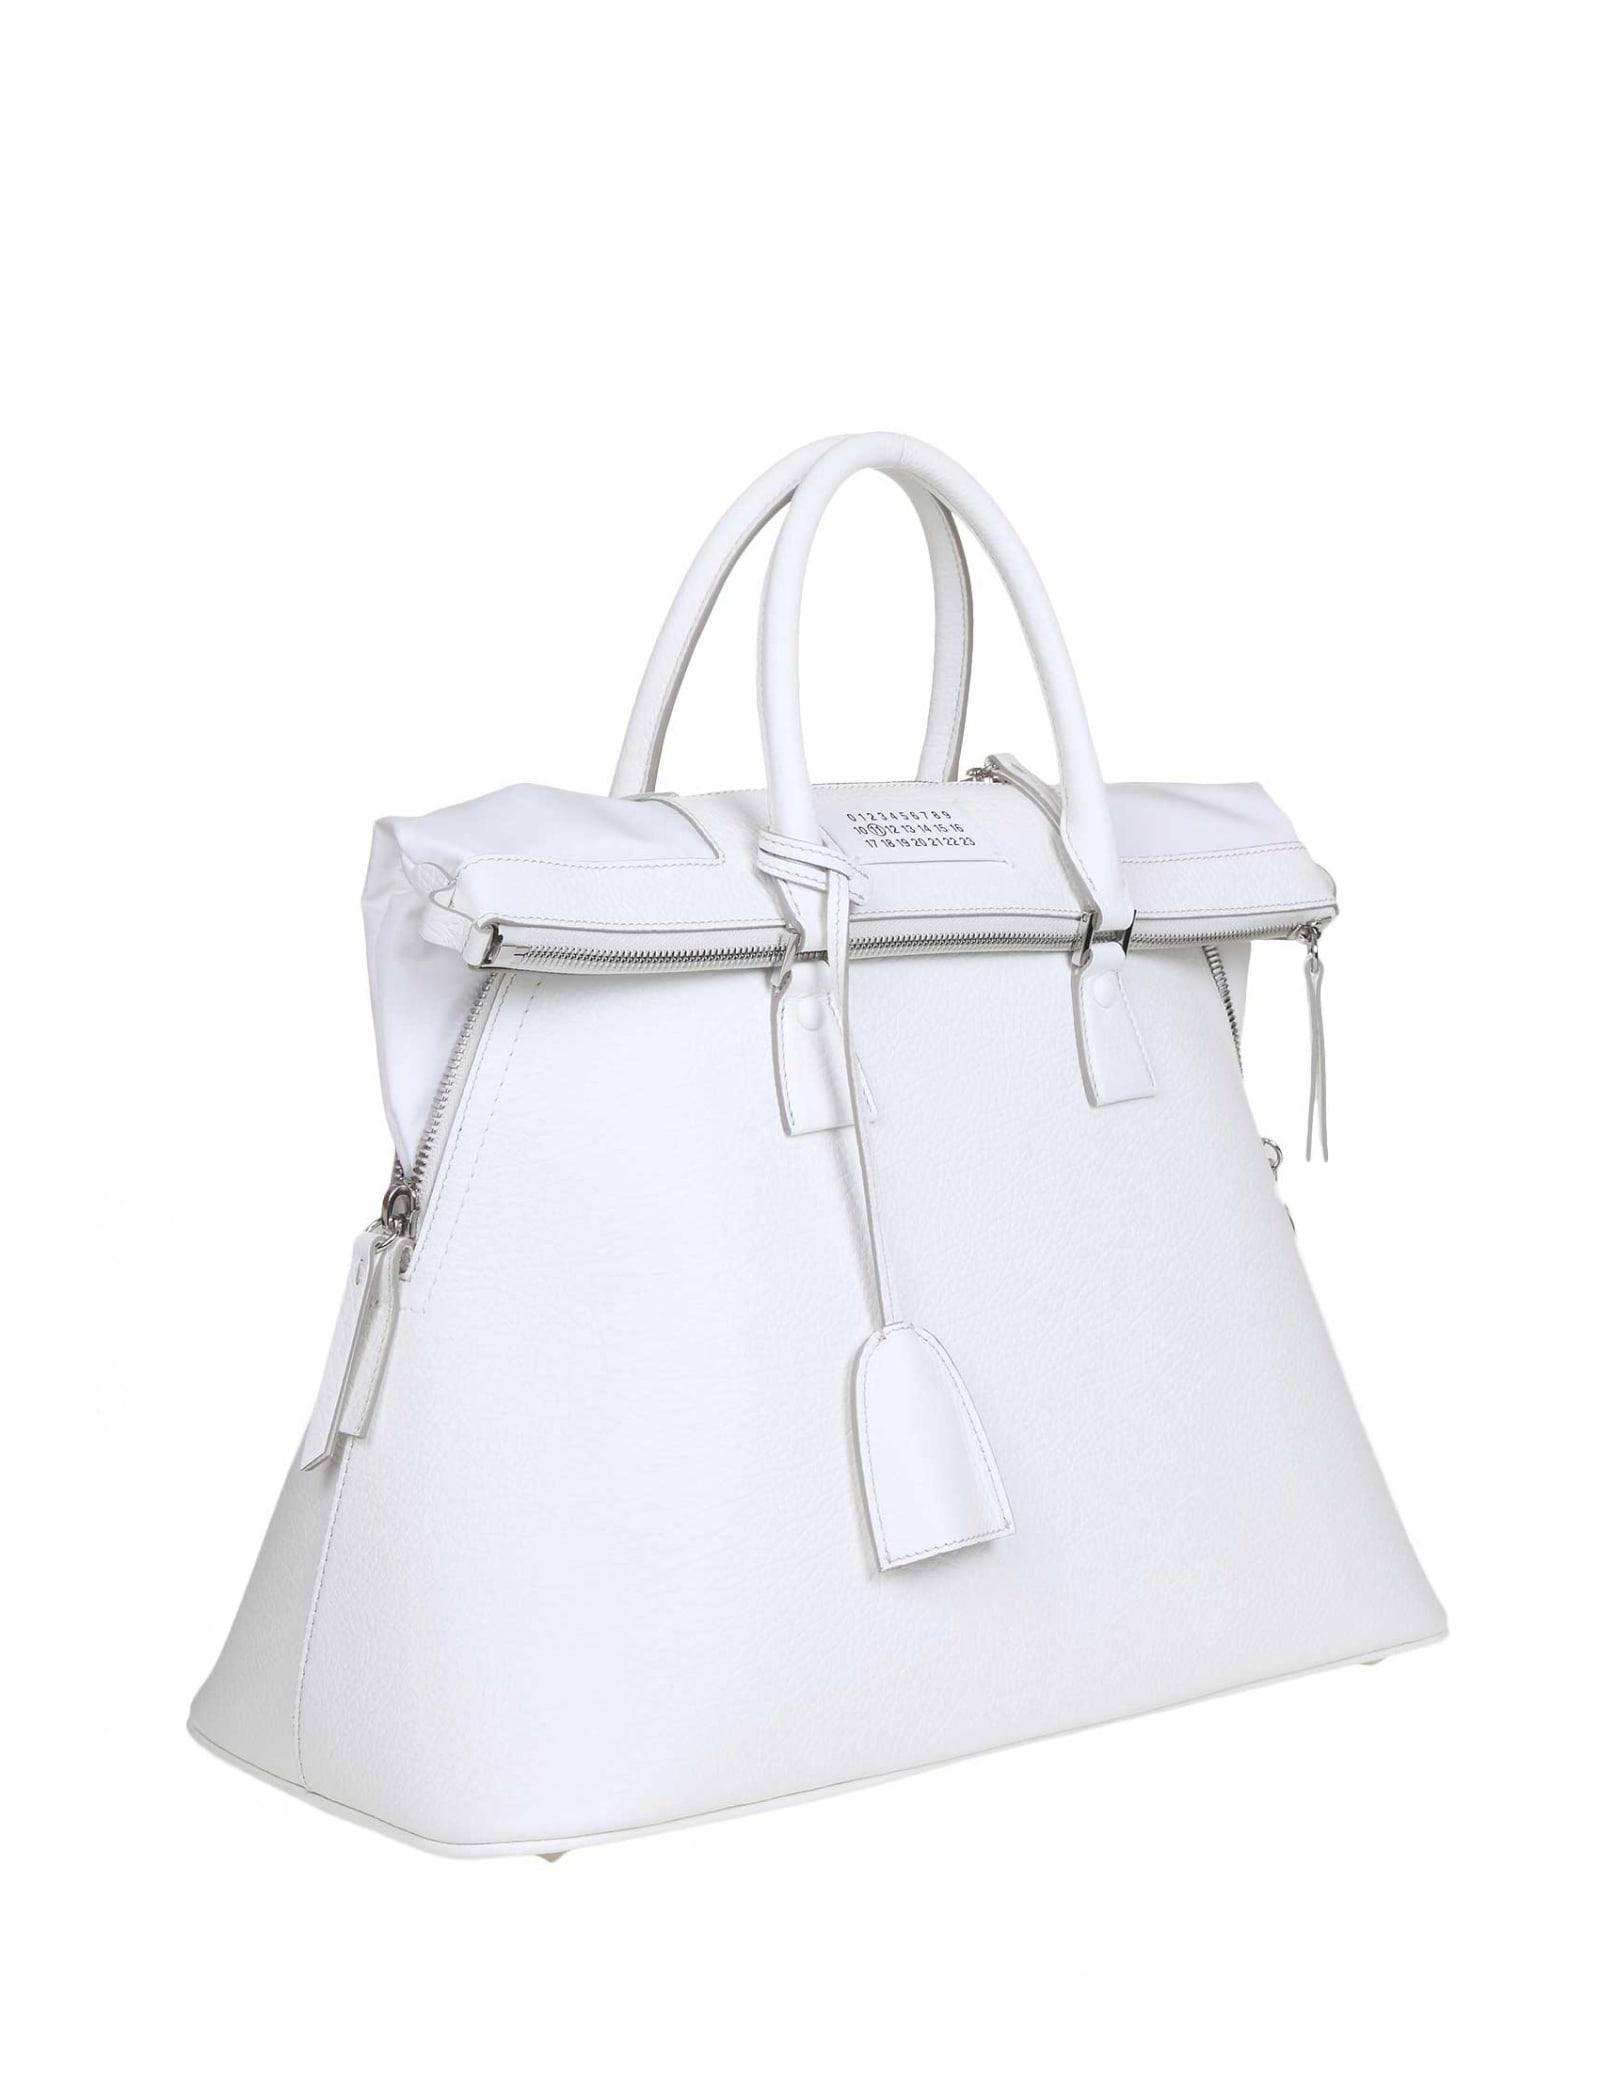 Maison Margiela 5ac Handbag In White Calf Leather